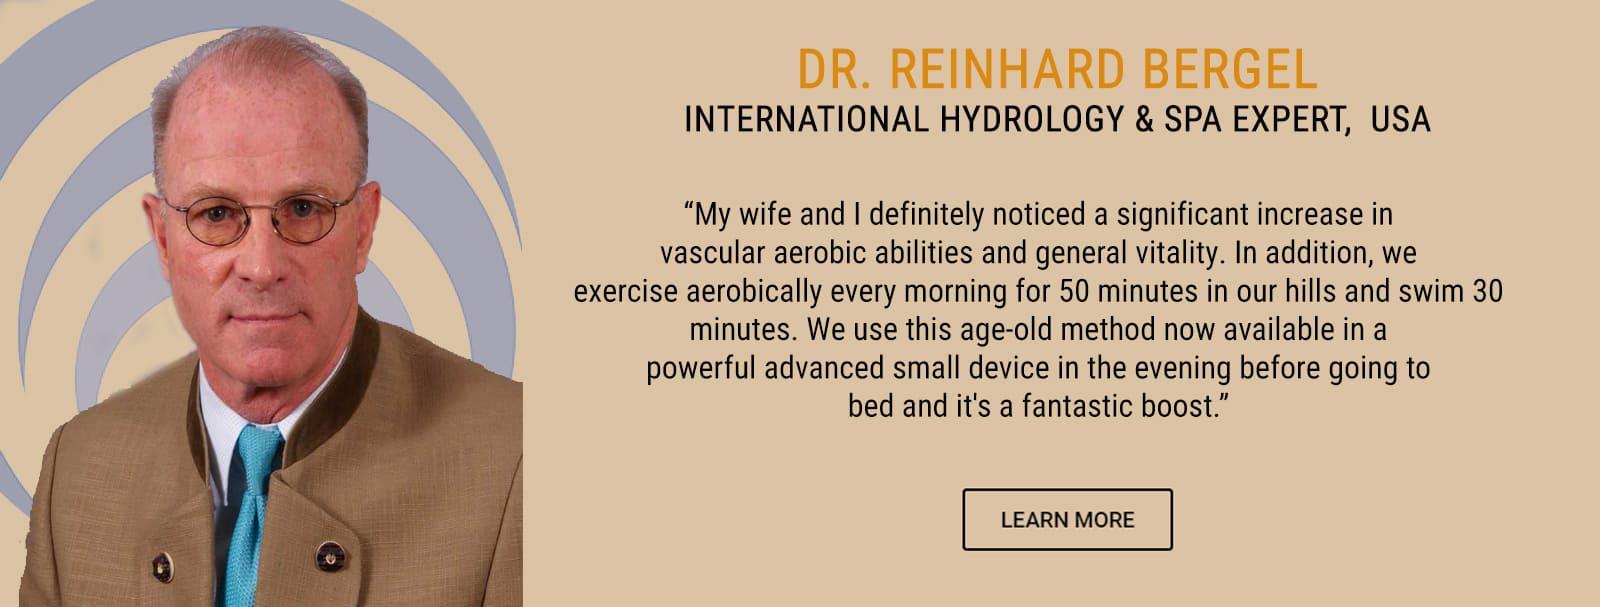 Dr. Reinhard Bergel